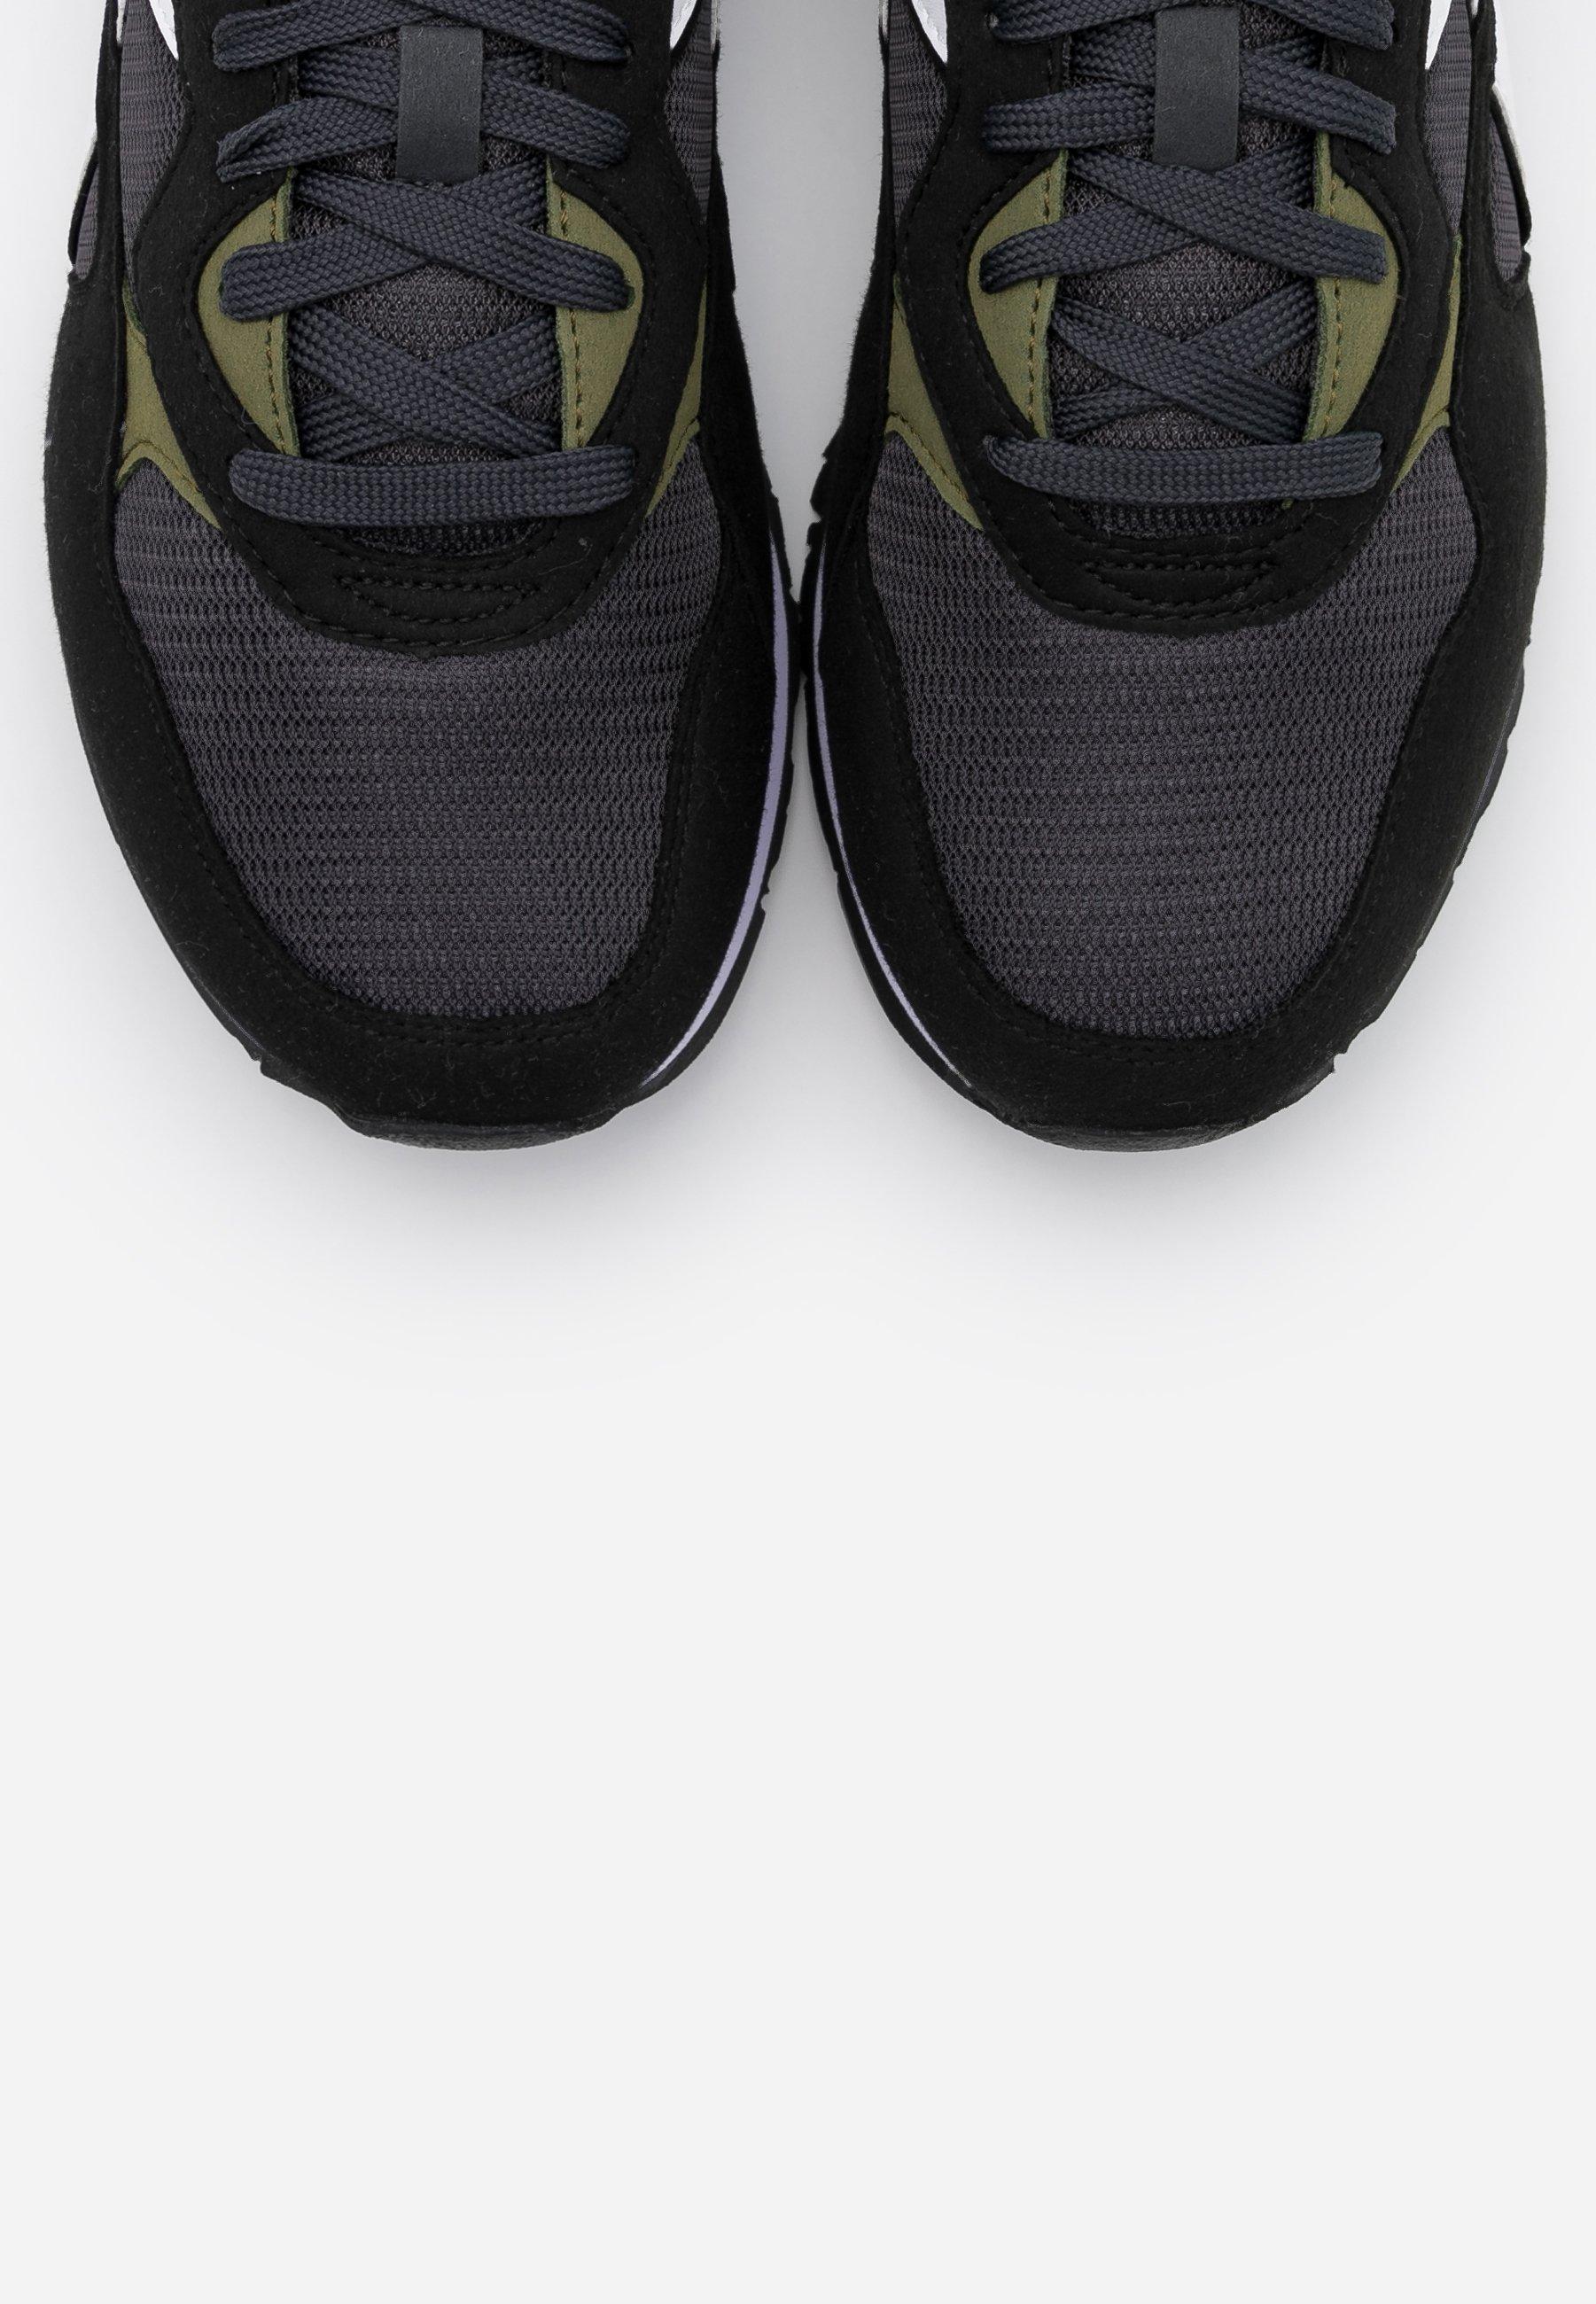 Offrire Scarpe da uomo Diadora N.92 Sneakers basse black phantom